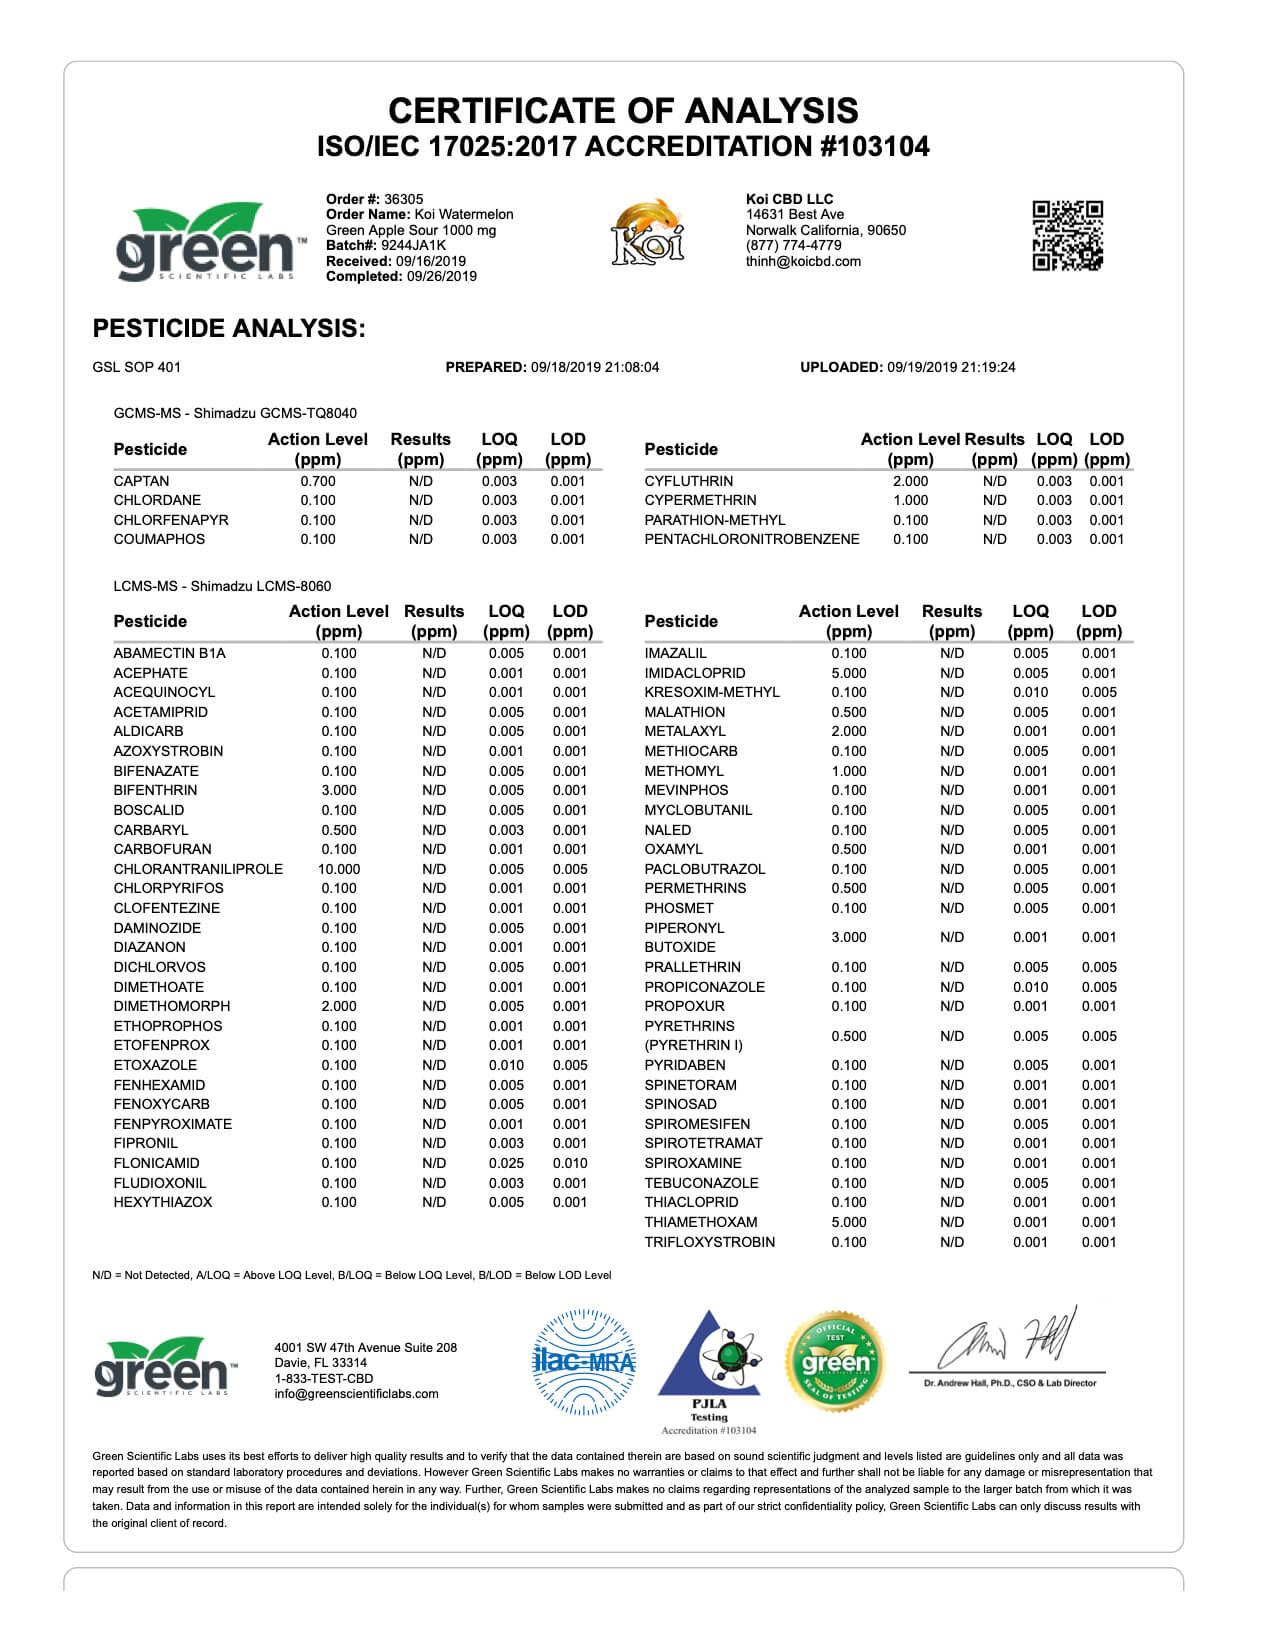 Koi CBD Watermelon Green Apple Sour Vape Oil 1000mg page3